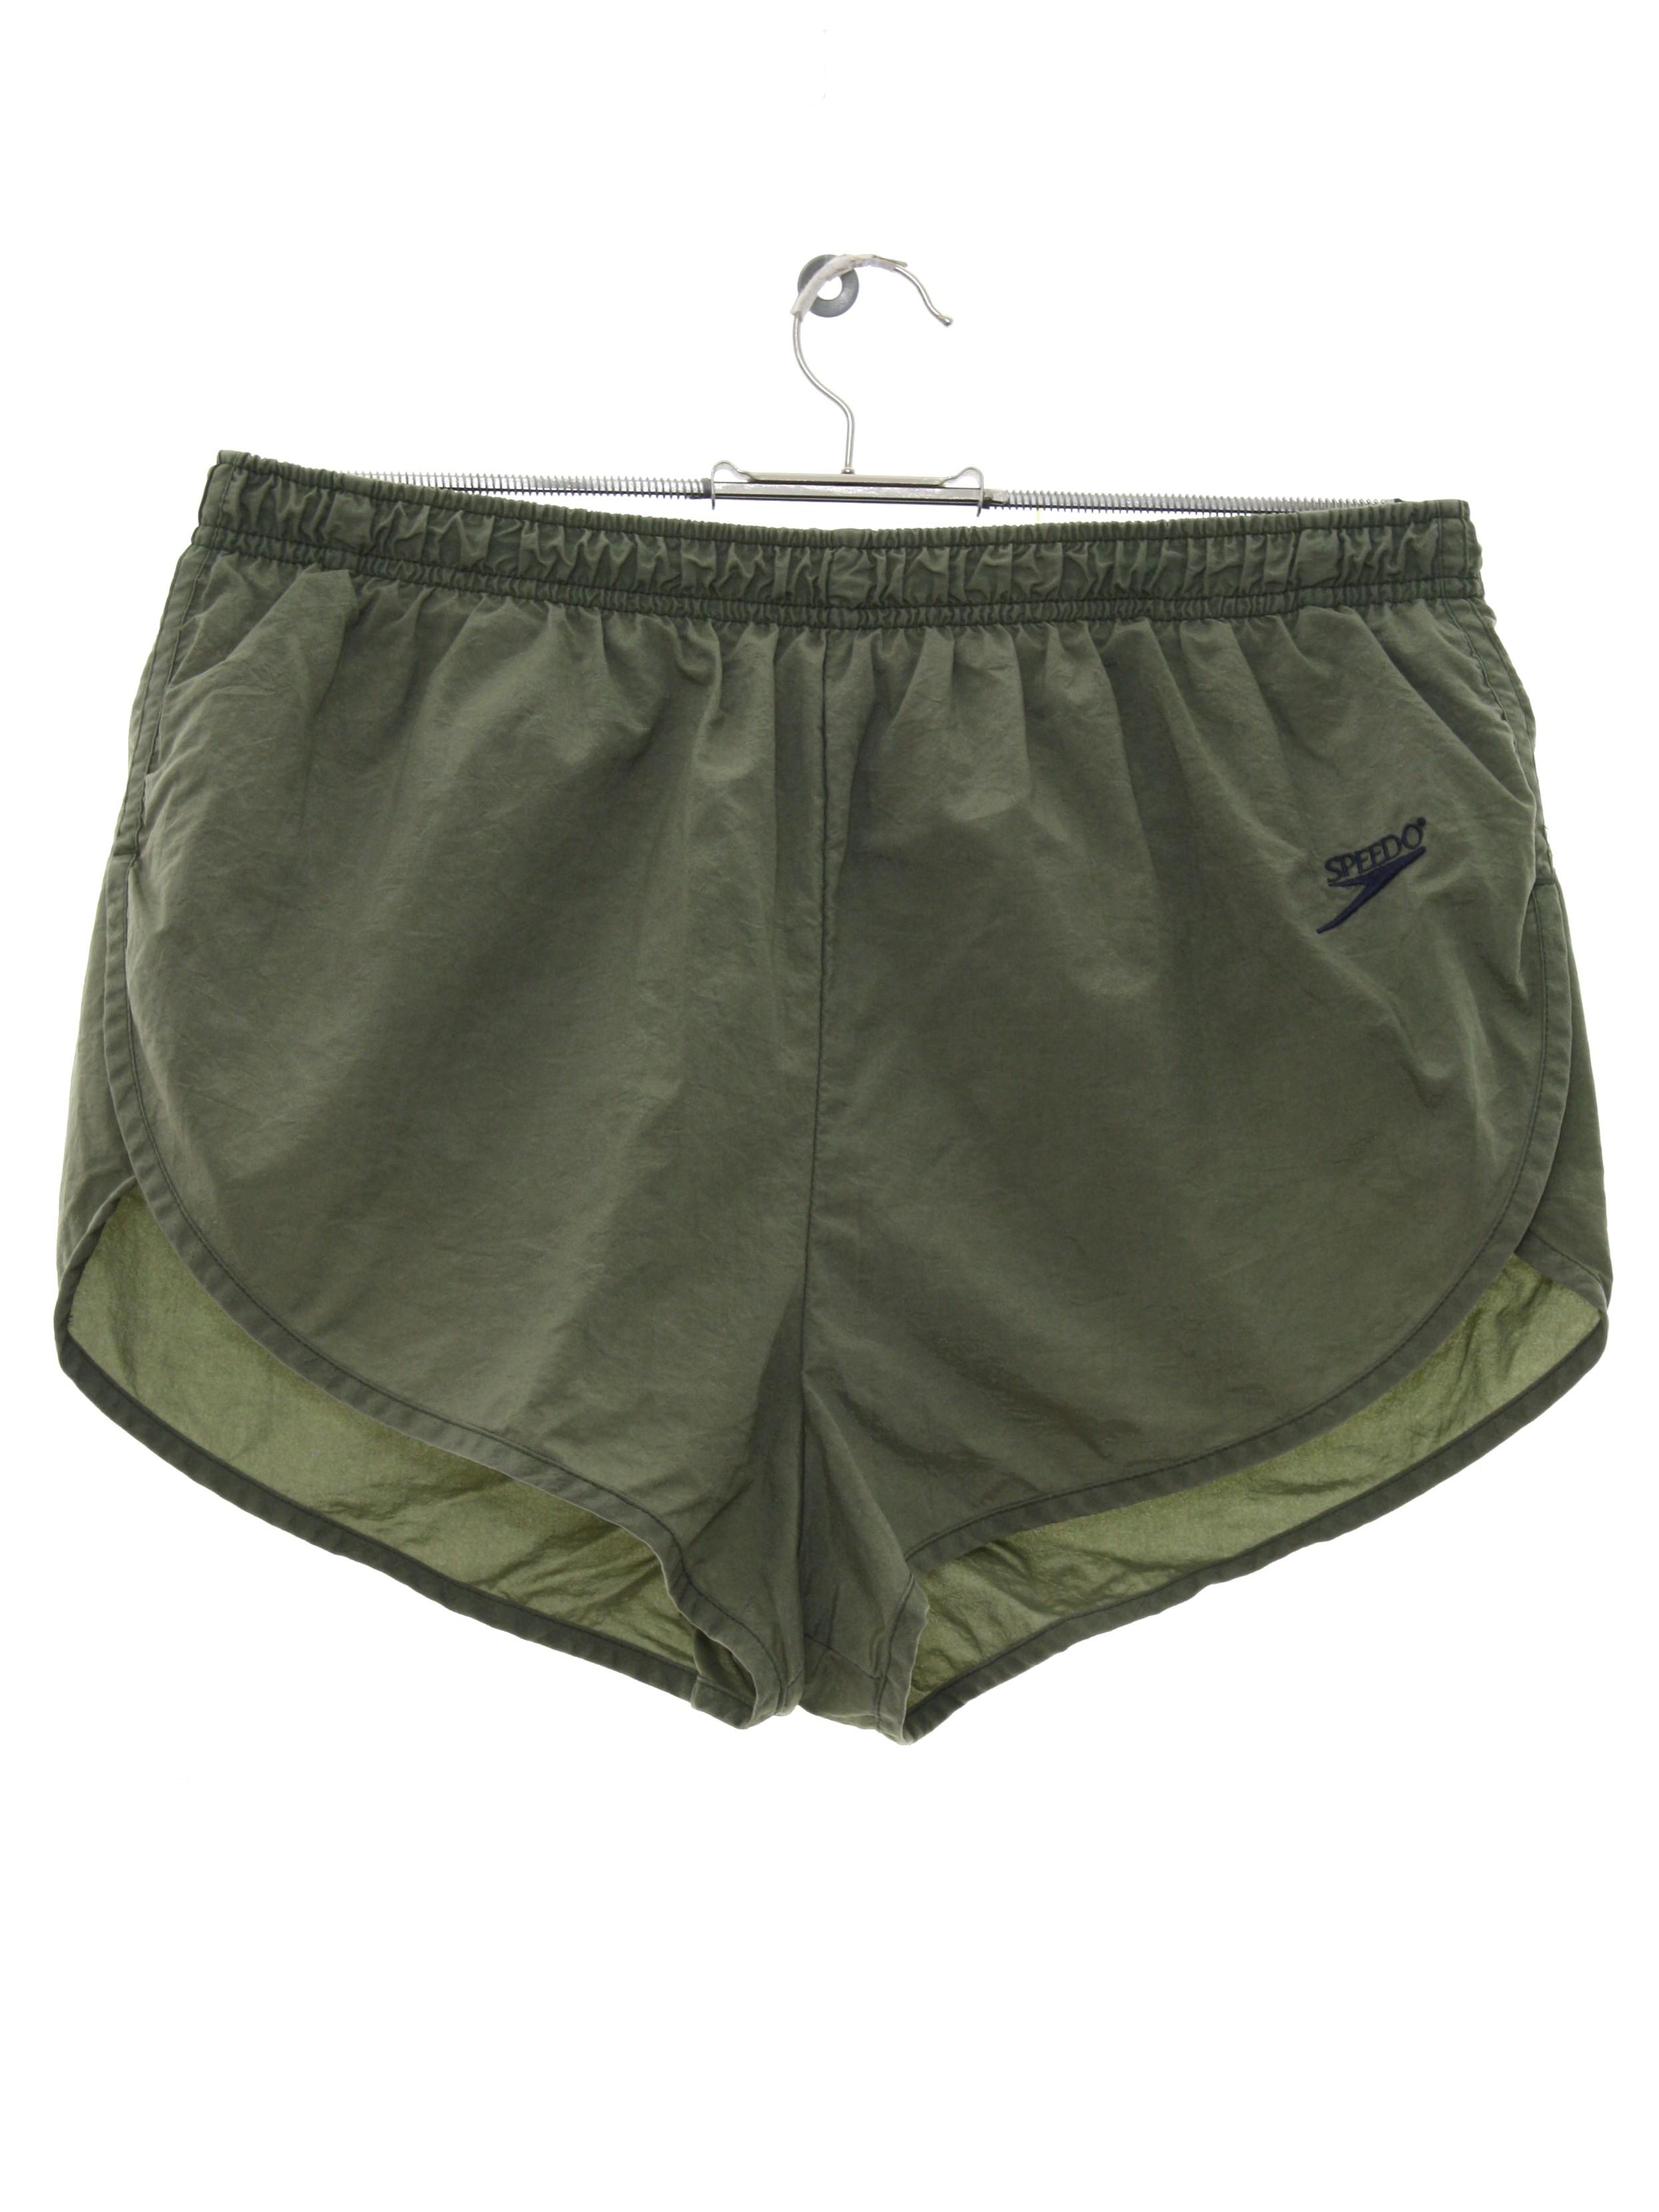 90s Shorts (Speedo): 90s -Speedo- Mens khaki green background ...